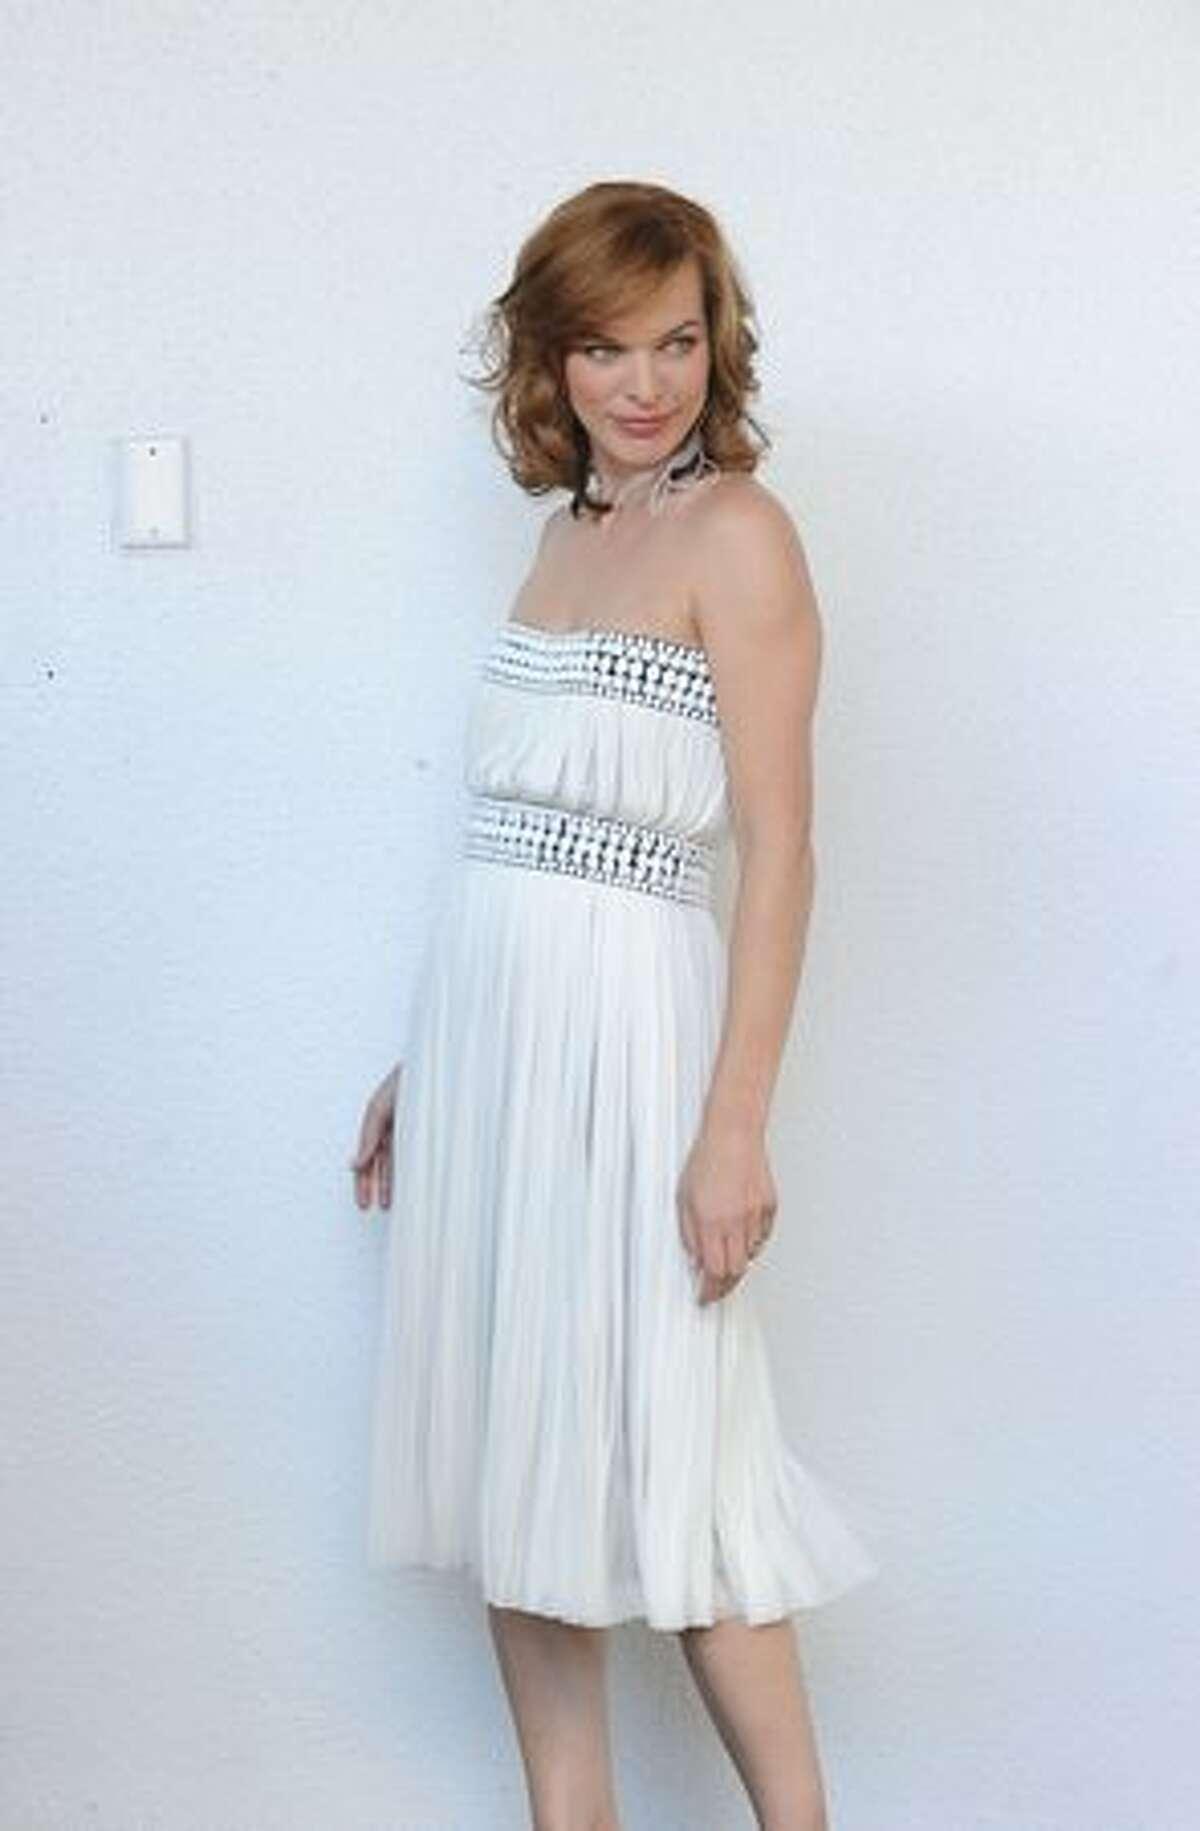 Actress Milla Jovavich attends